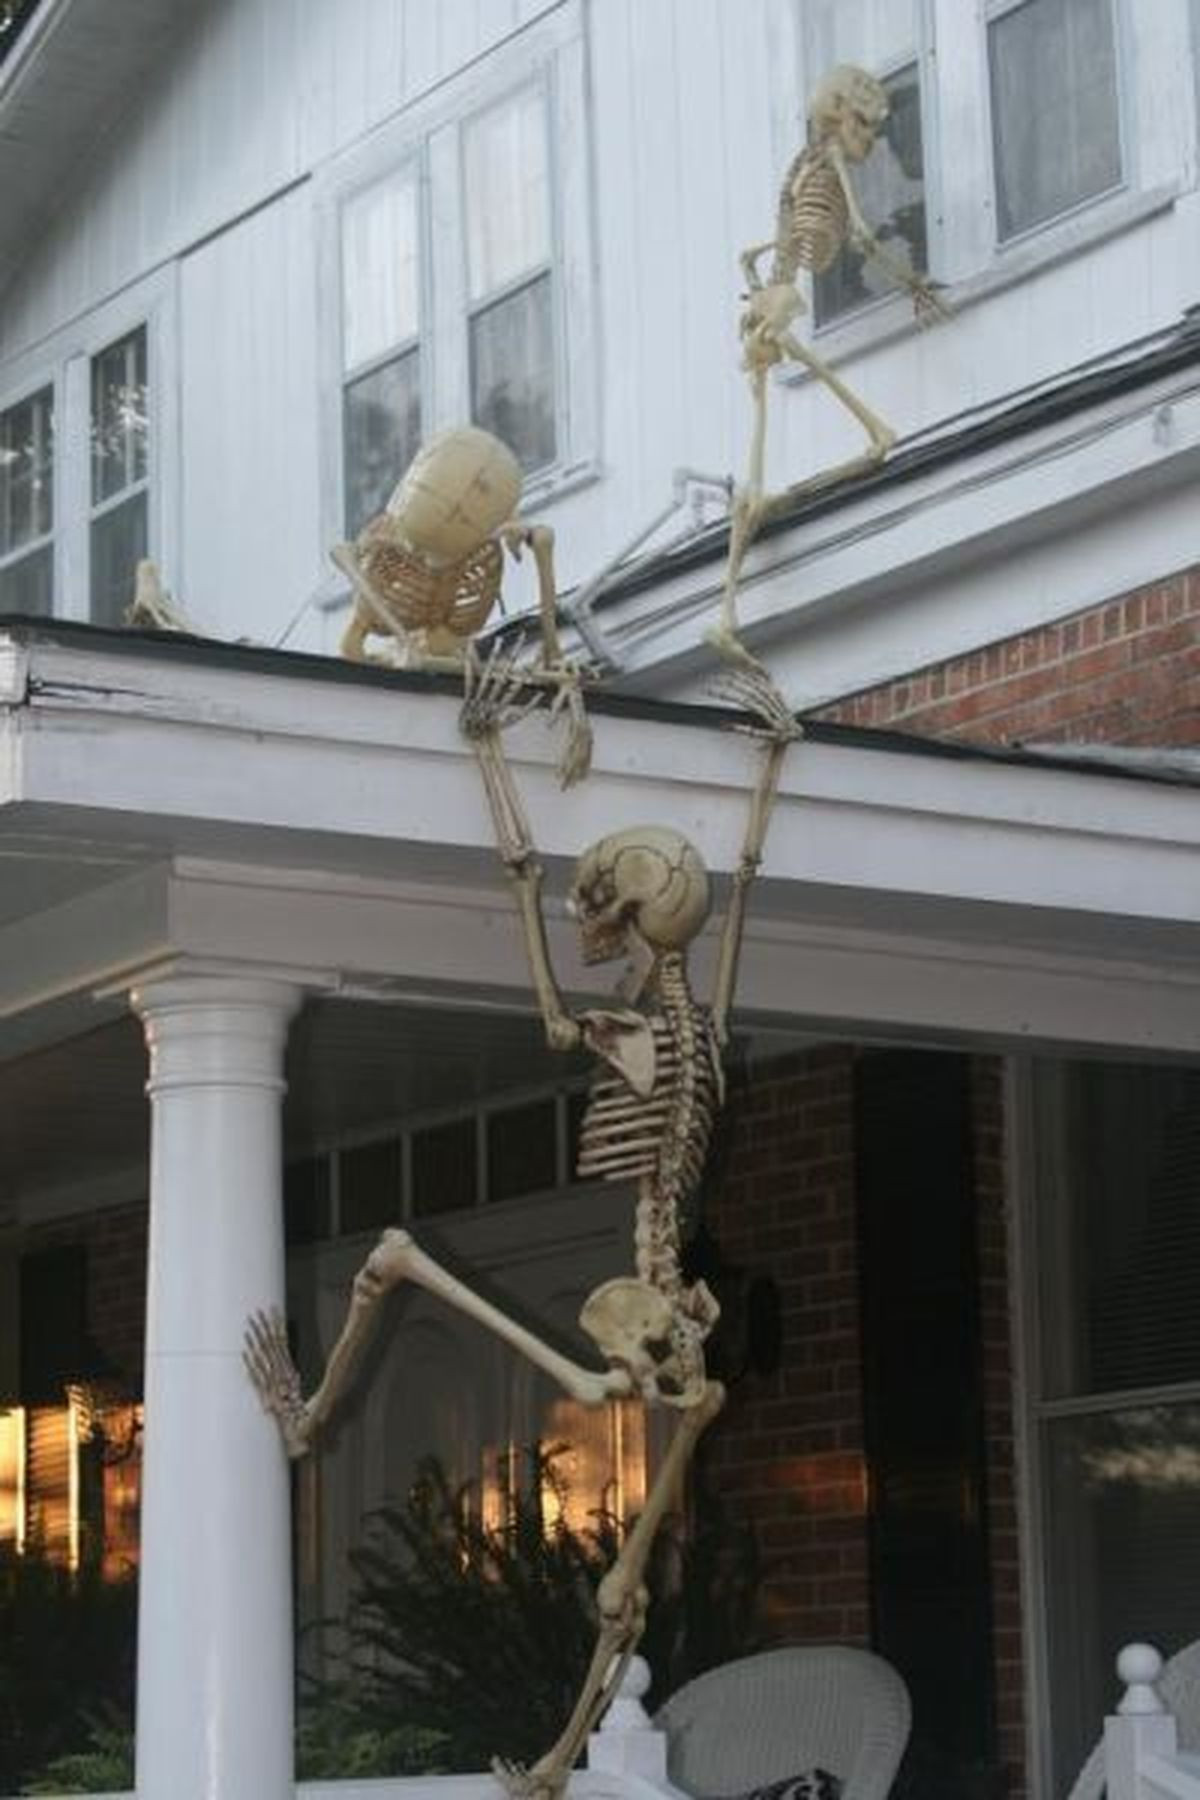 Outdoor Halloween Decorations Ideas  plete List of Halloween Decorations Ideas In Your Home